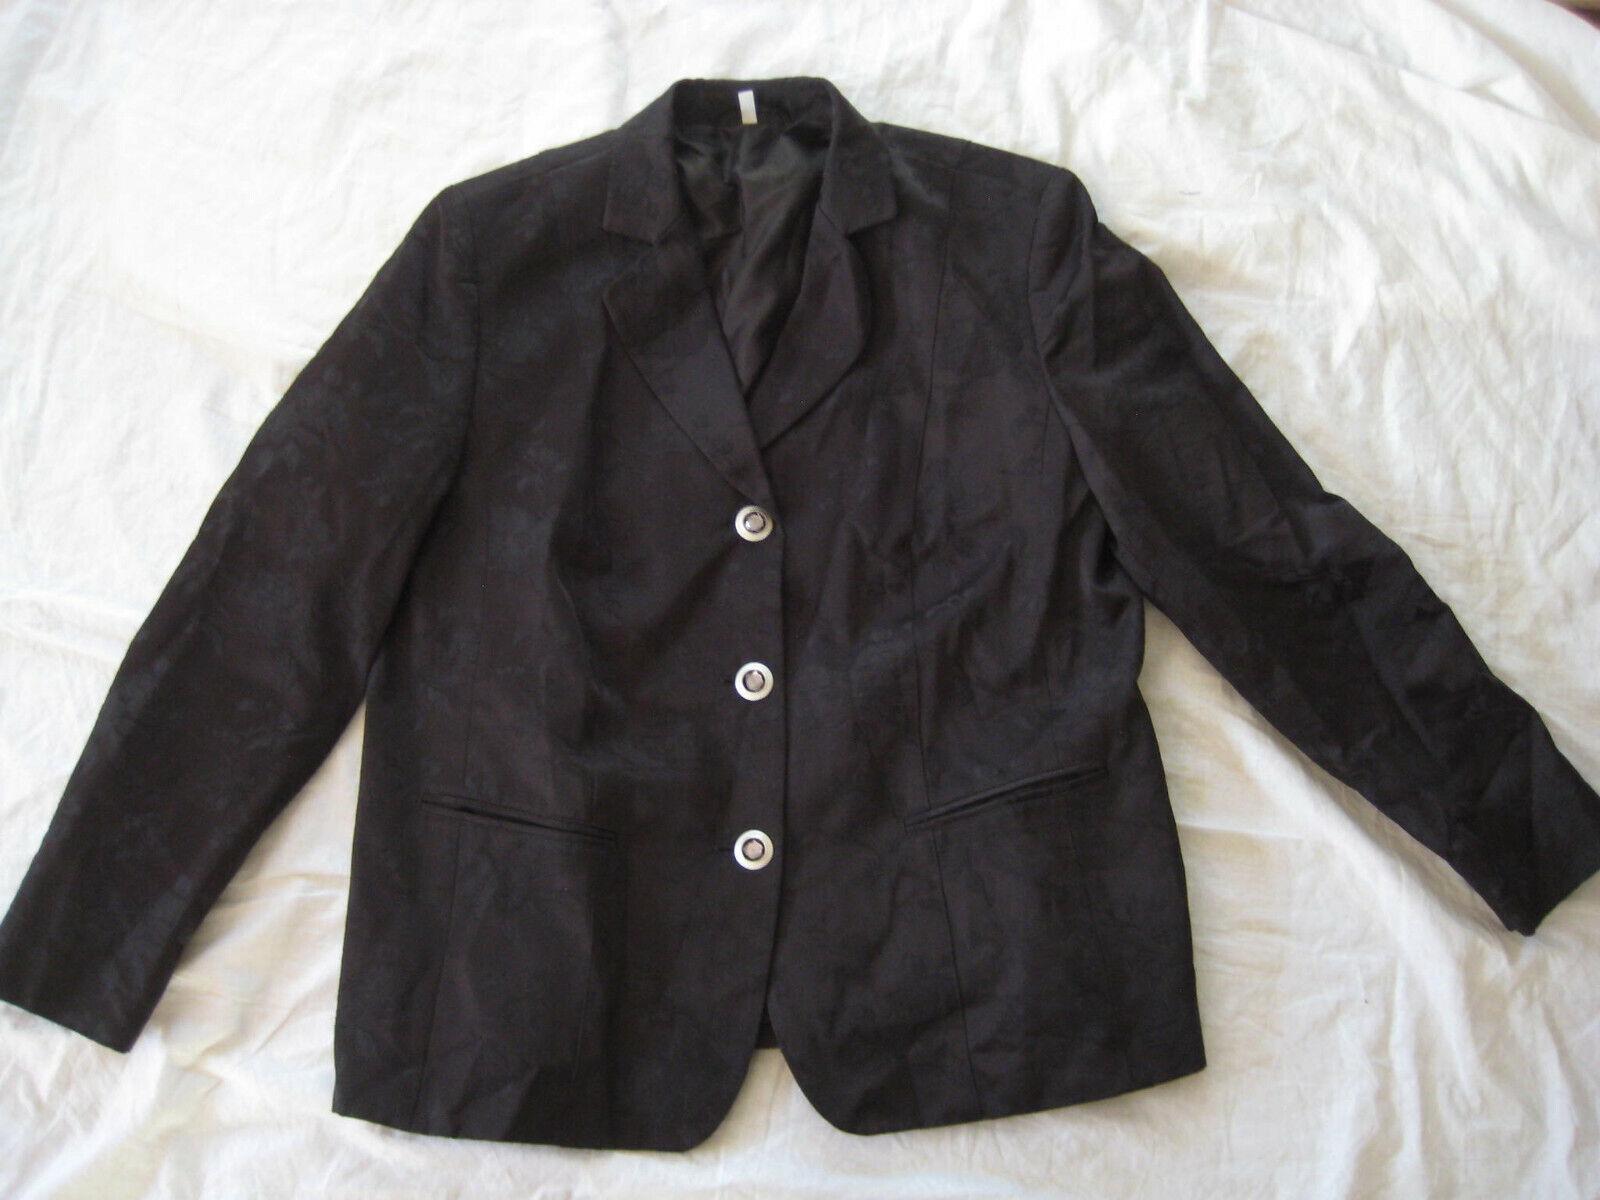 BEXLEYS Damen Jacke Blazer schwarz mit Blumen Muster Ton-in-Ton Gr 44 w NEU 1xge